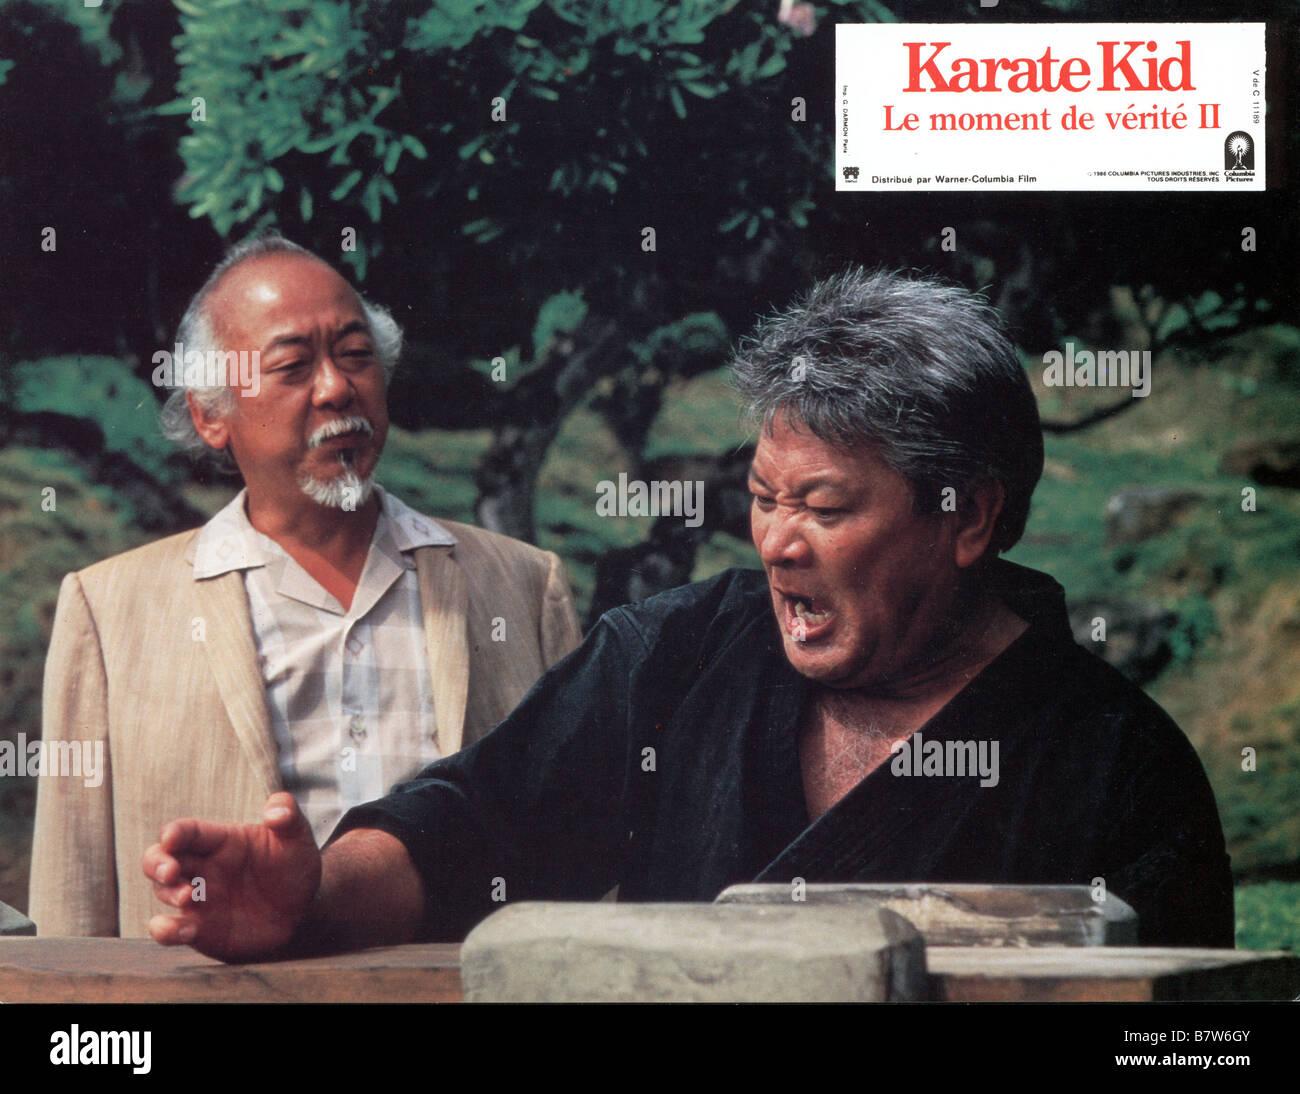 The Karate Kid Year: 1984 USA Pat Morita  Director: John G. Avildsen - Stock Image